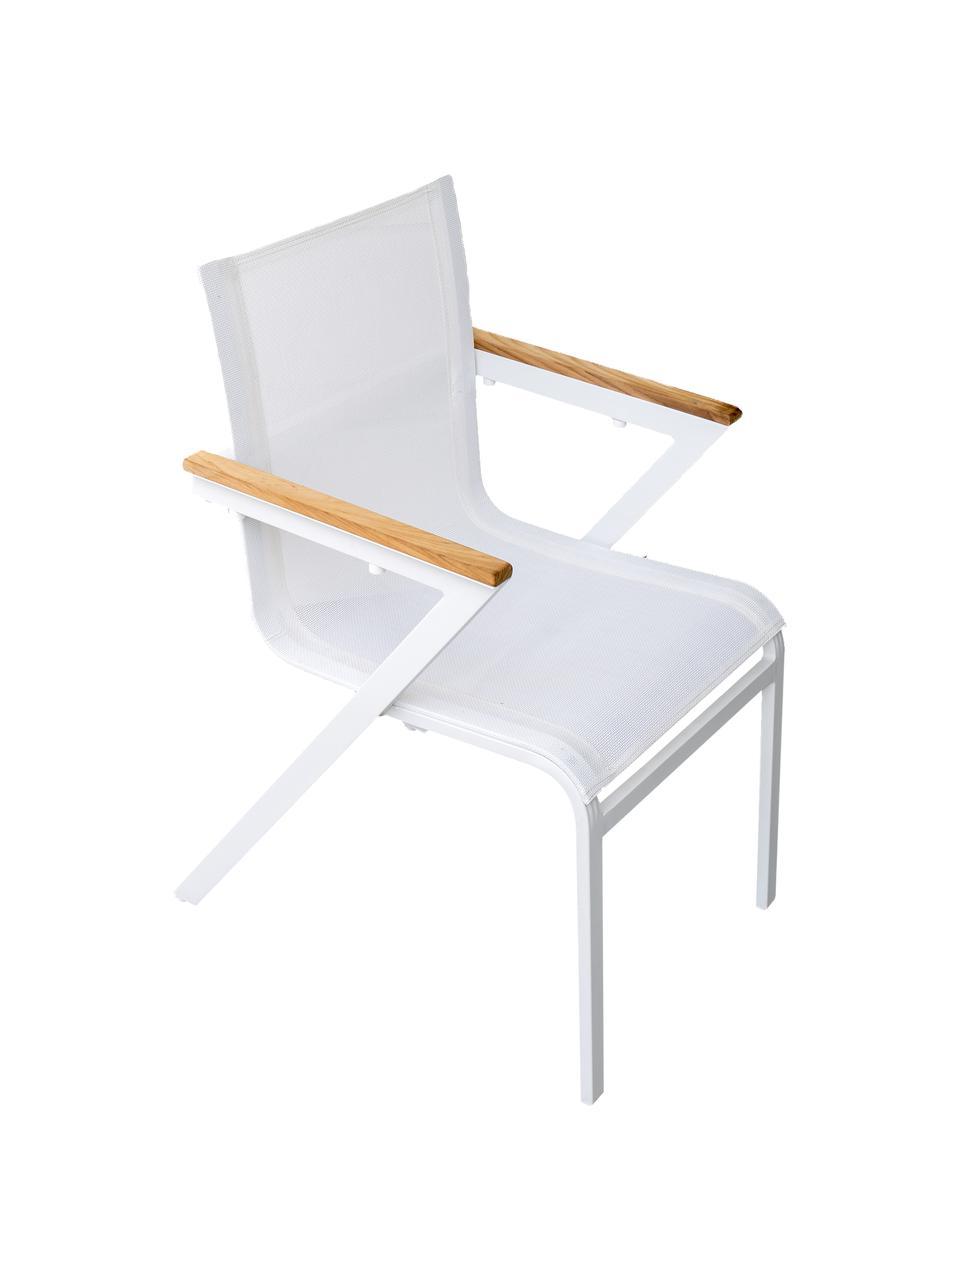 Garten-Armlehnstühle Mexico, 2 Stück, Gestell: Aluminium, lackiert, Sitzfläche: Textilene, Armlehnen: Teakholz, Weiß, Braun, B 57 x T 63 cm